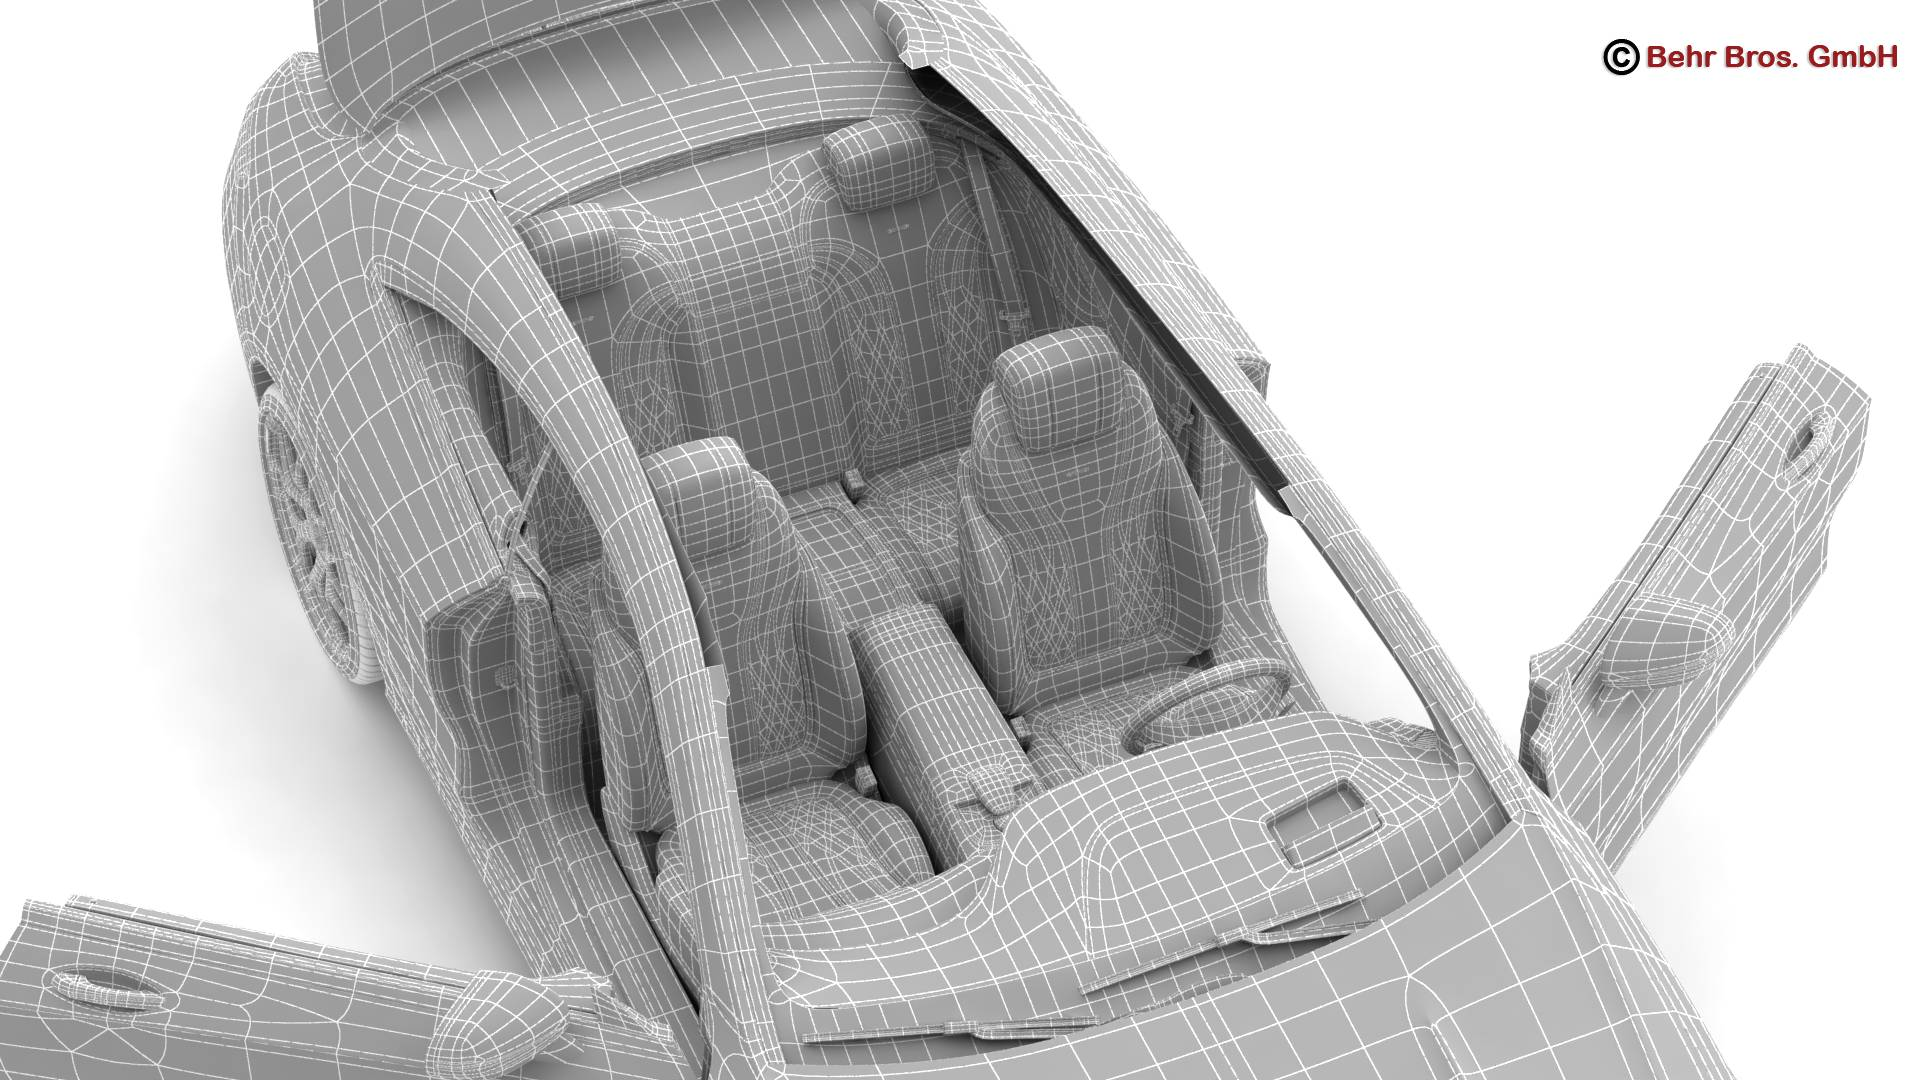 mercedes s klase kupeja s63 2018 3d modelis 3ds max fbx c4d lwo ma mb obj 274121